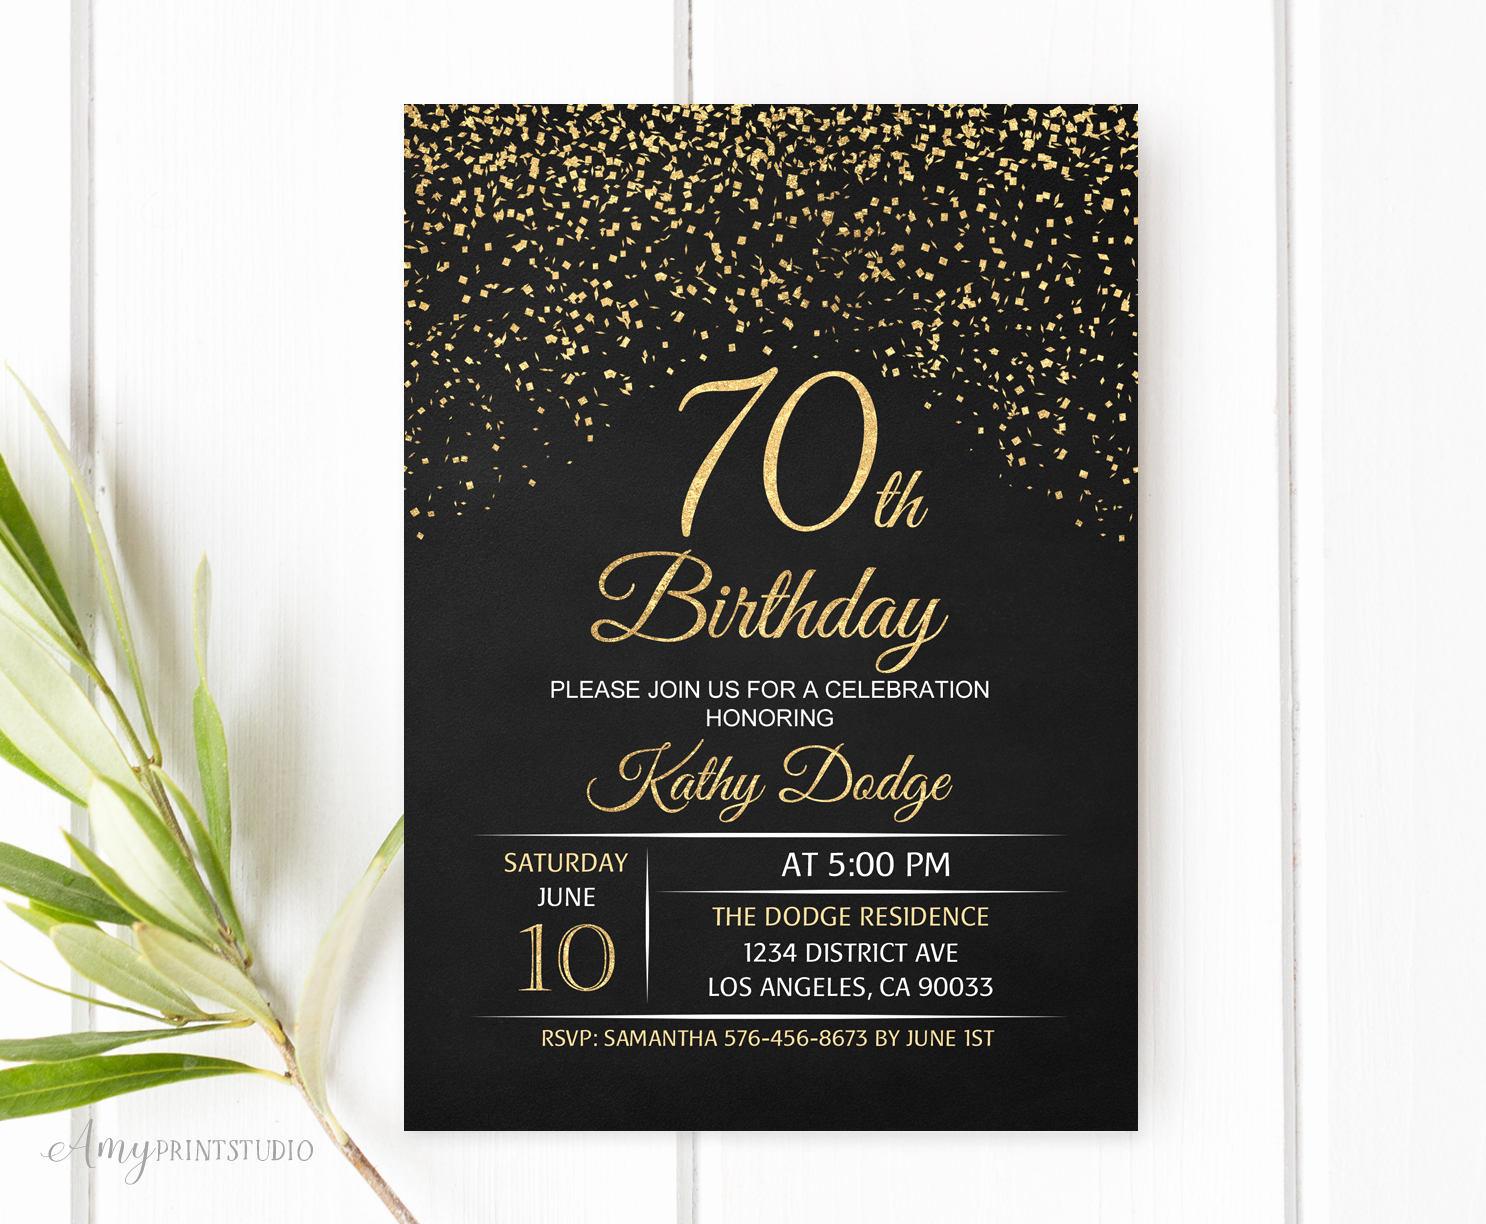 70th Birthday Invitation Ideas Best Of Ideas Immaculate Ideas for 70th Birthday Invitations